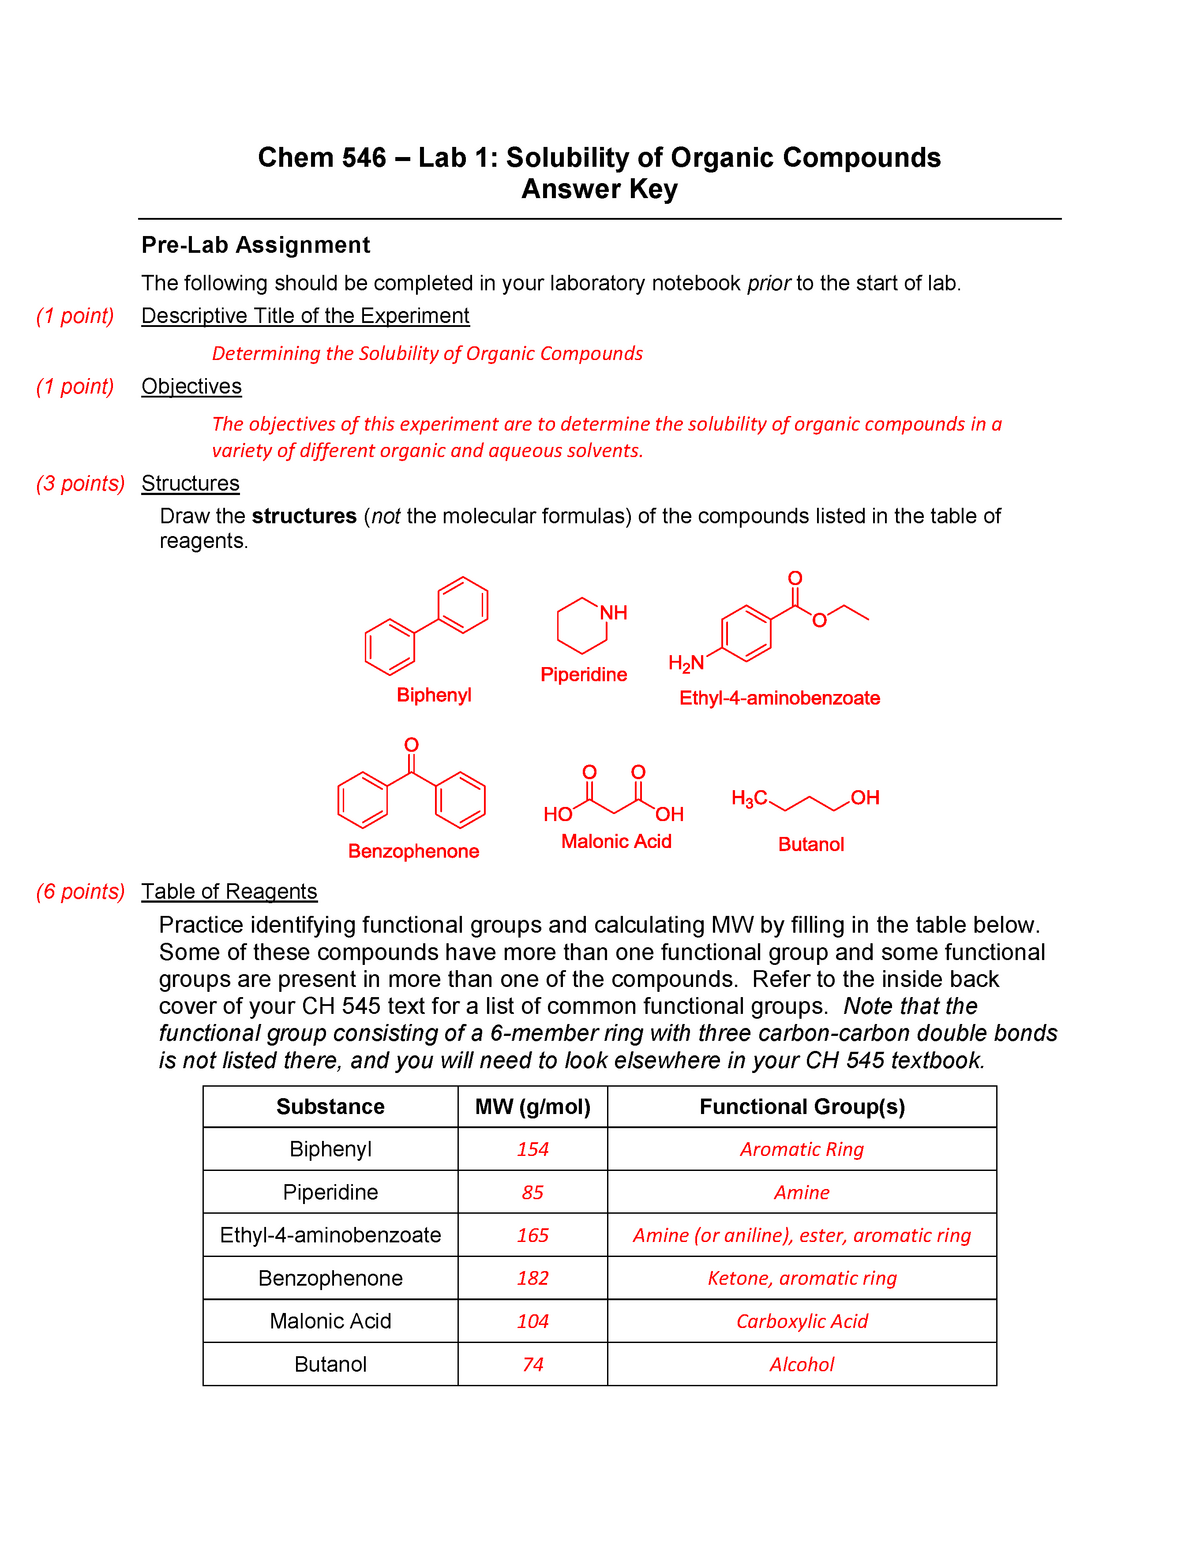 Solubility of Org Compounds Key - CHEM 545 Organic Chemistry